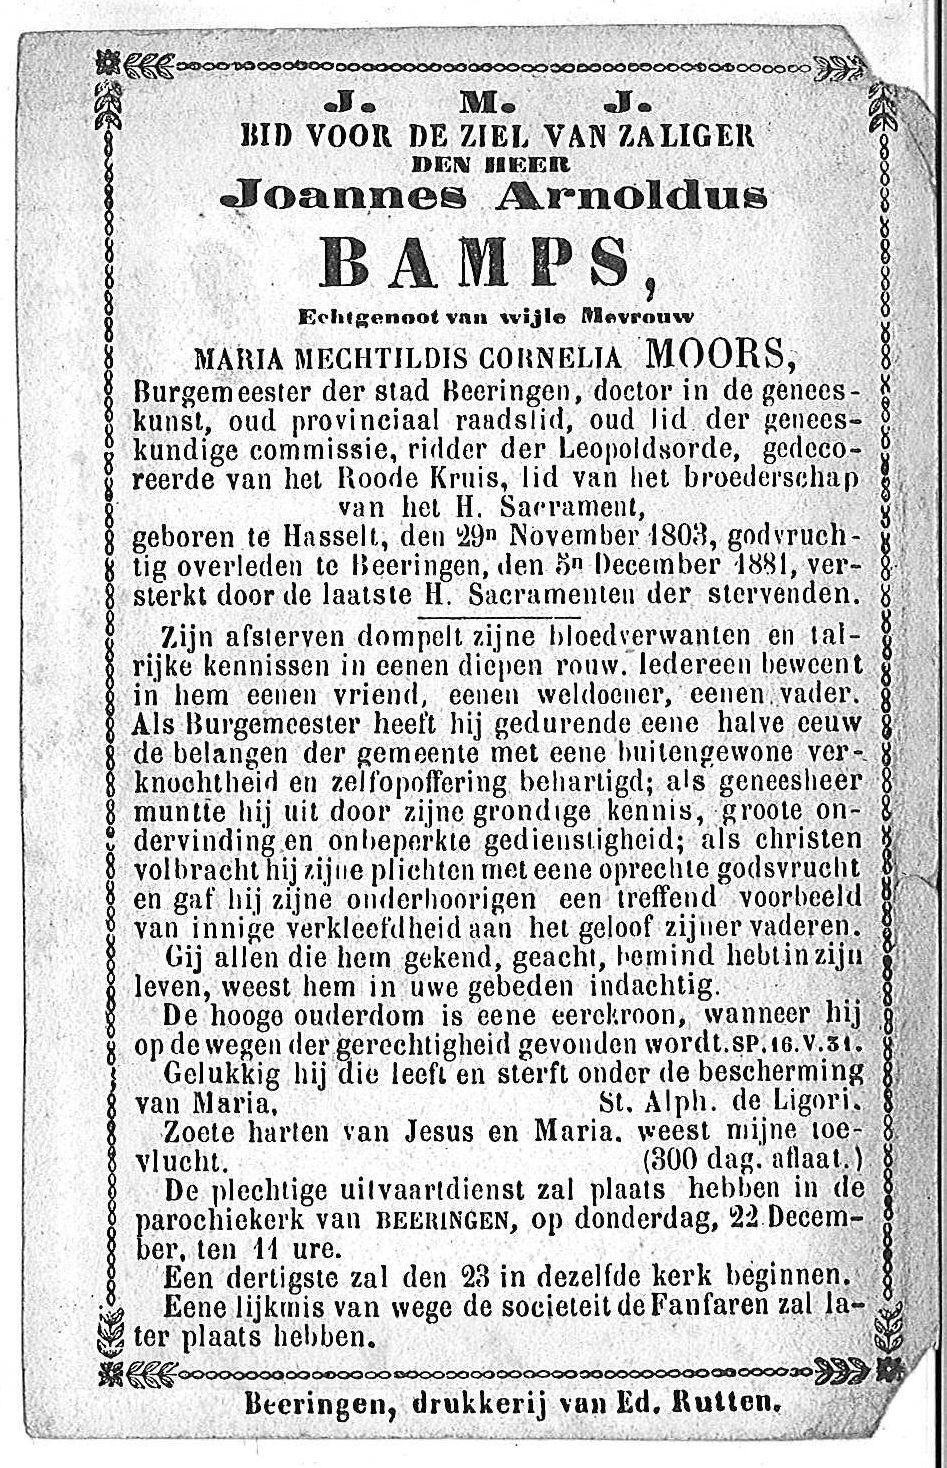 Joannes Arnoldus Bamps